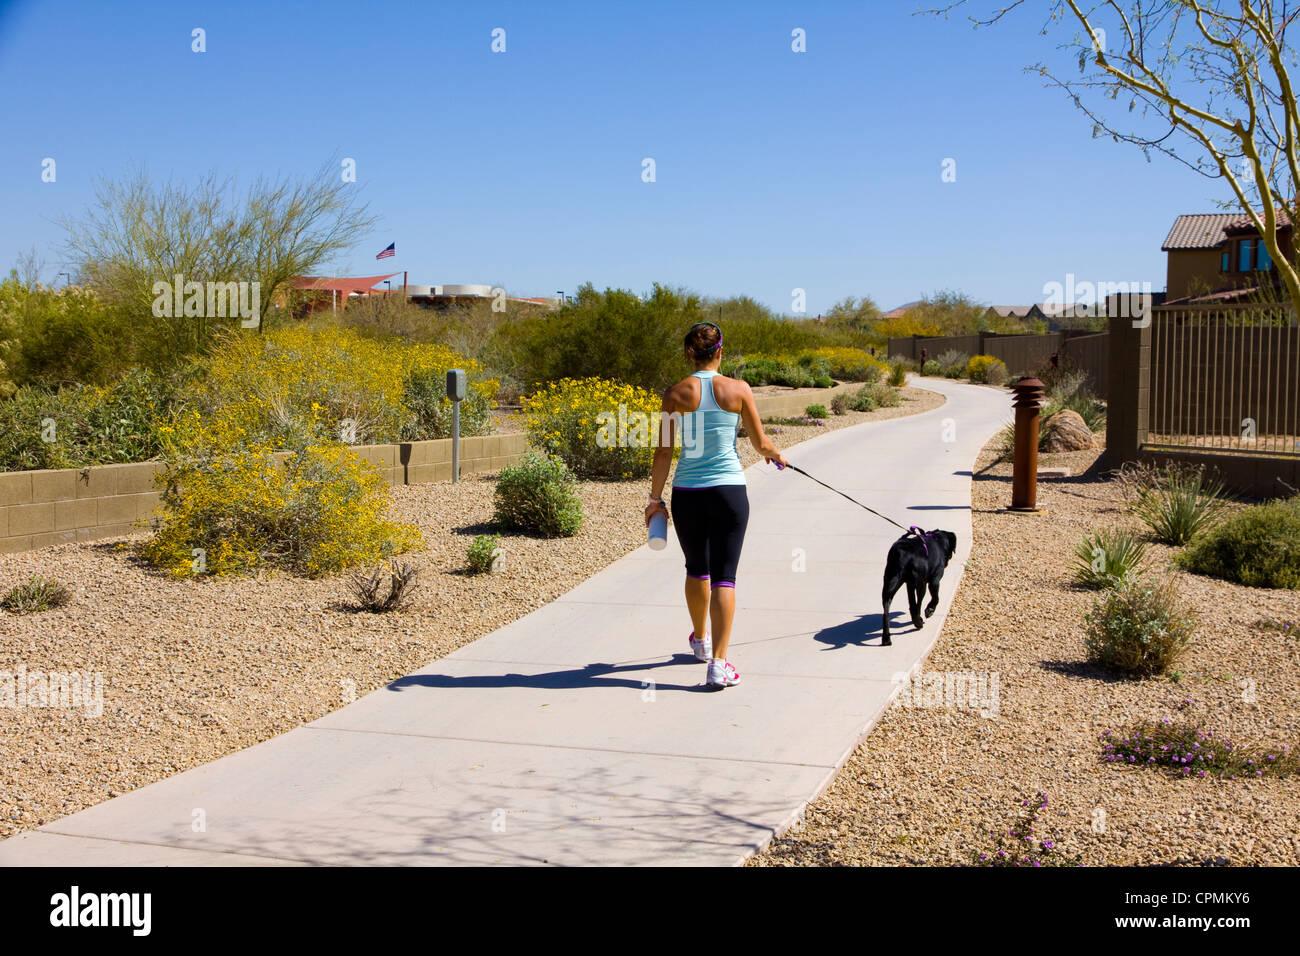 Pedestrian path, Fireside at Desert Ridge, N. Scottsdale, AZ, USA - Stock Image